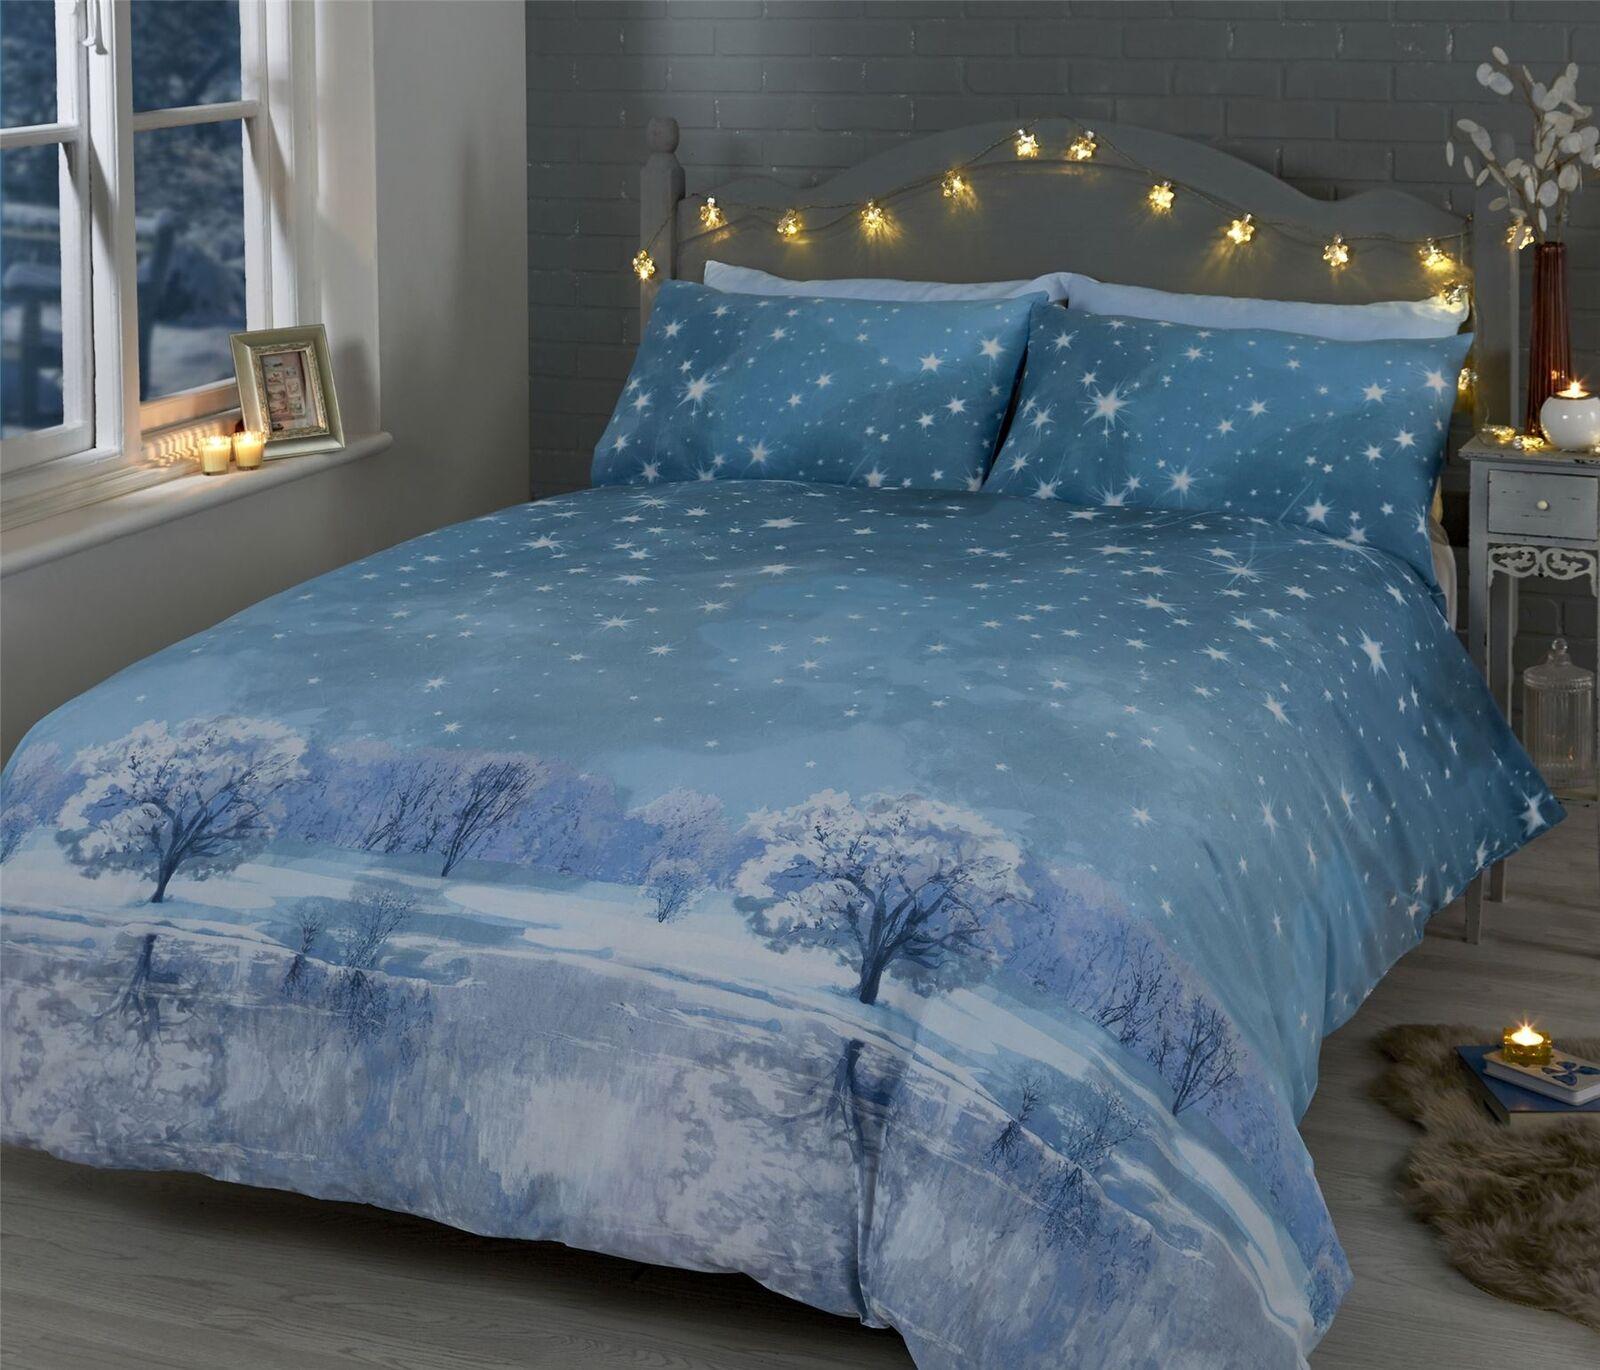 CHRISTMAS NIGHT STARS TREES SNOW Blau COTTON BLEND KING Größe 6 PIECE BEDDING SET